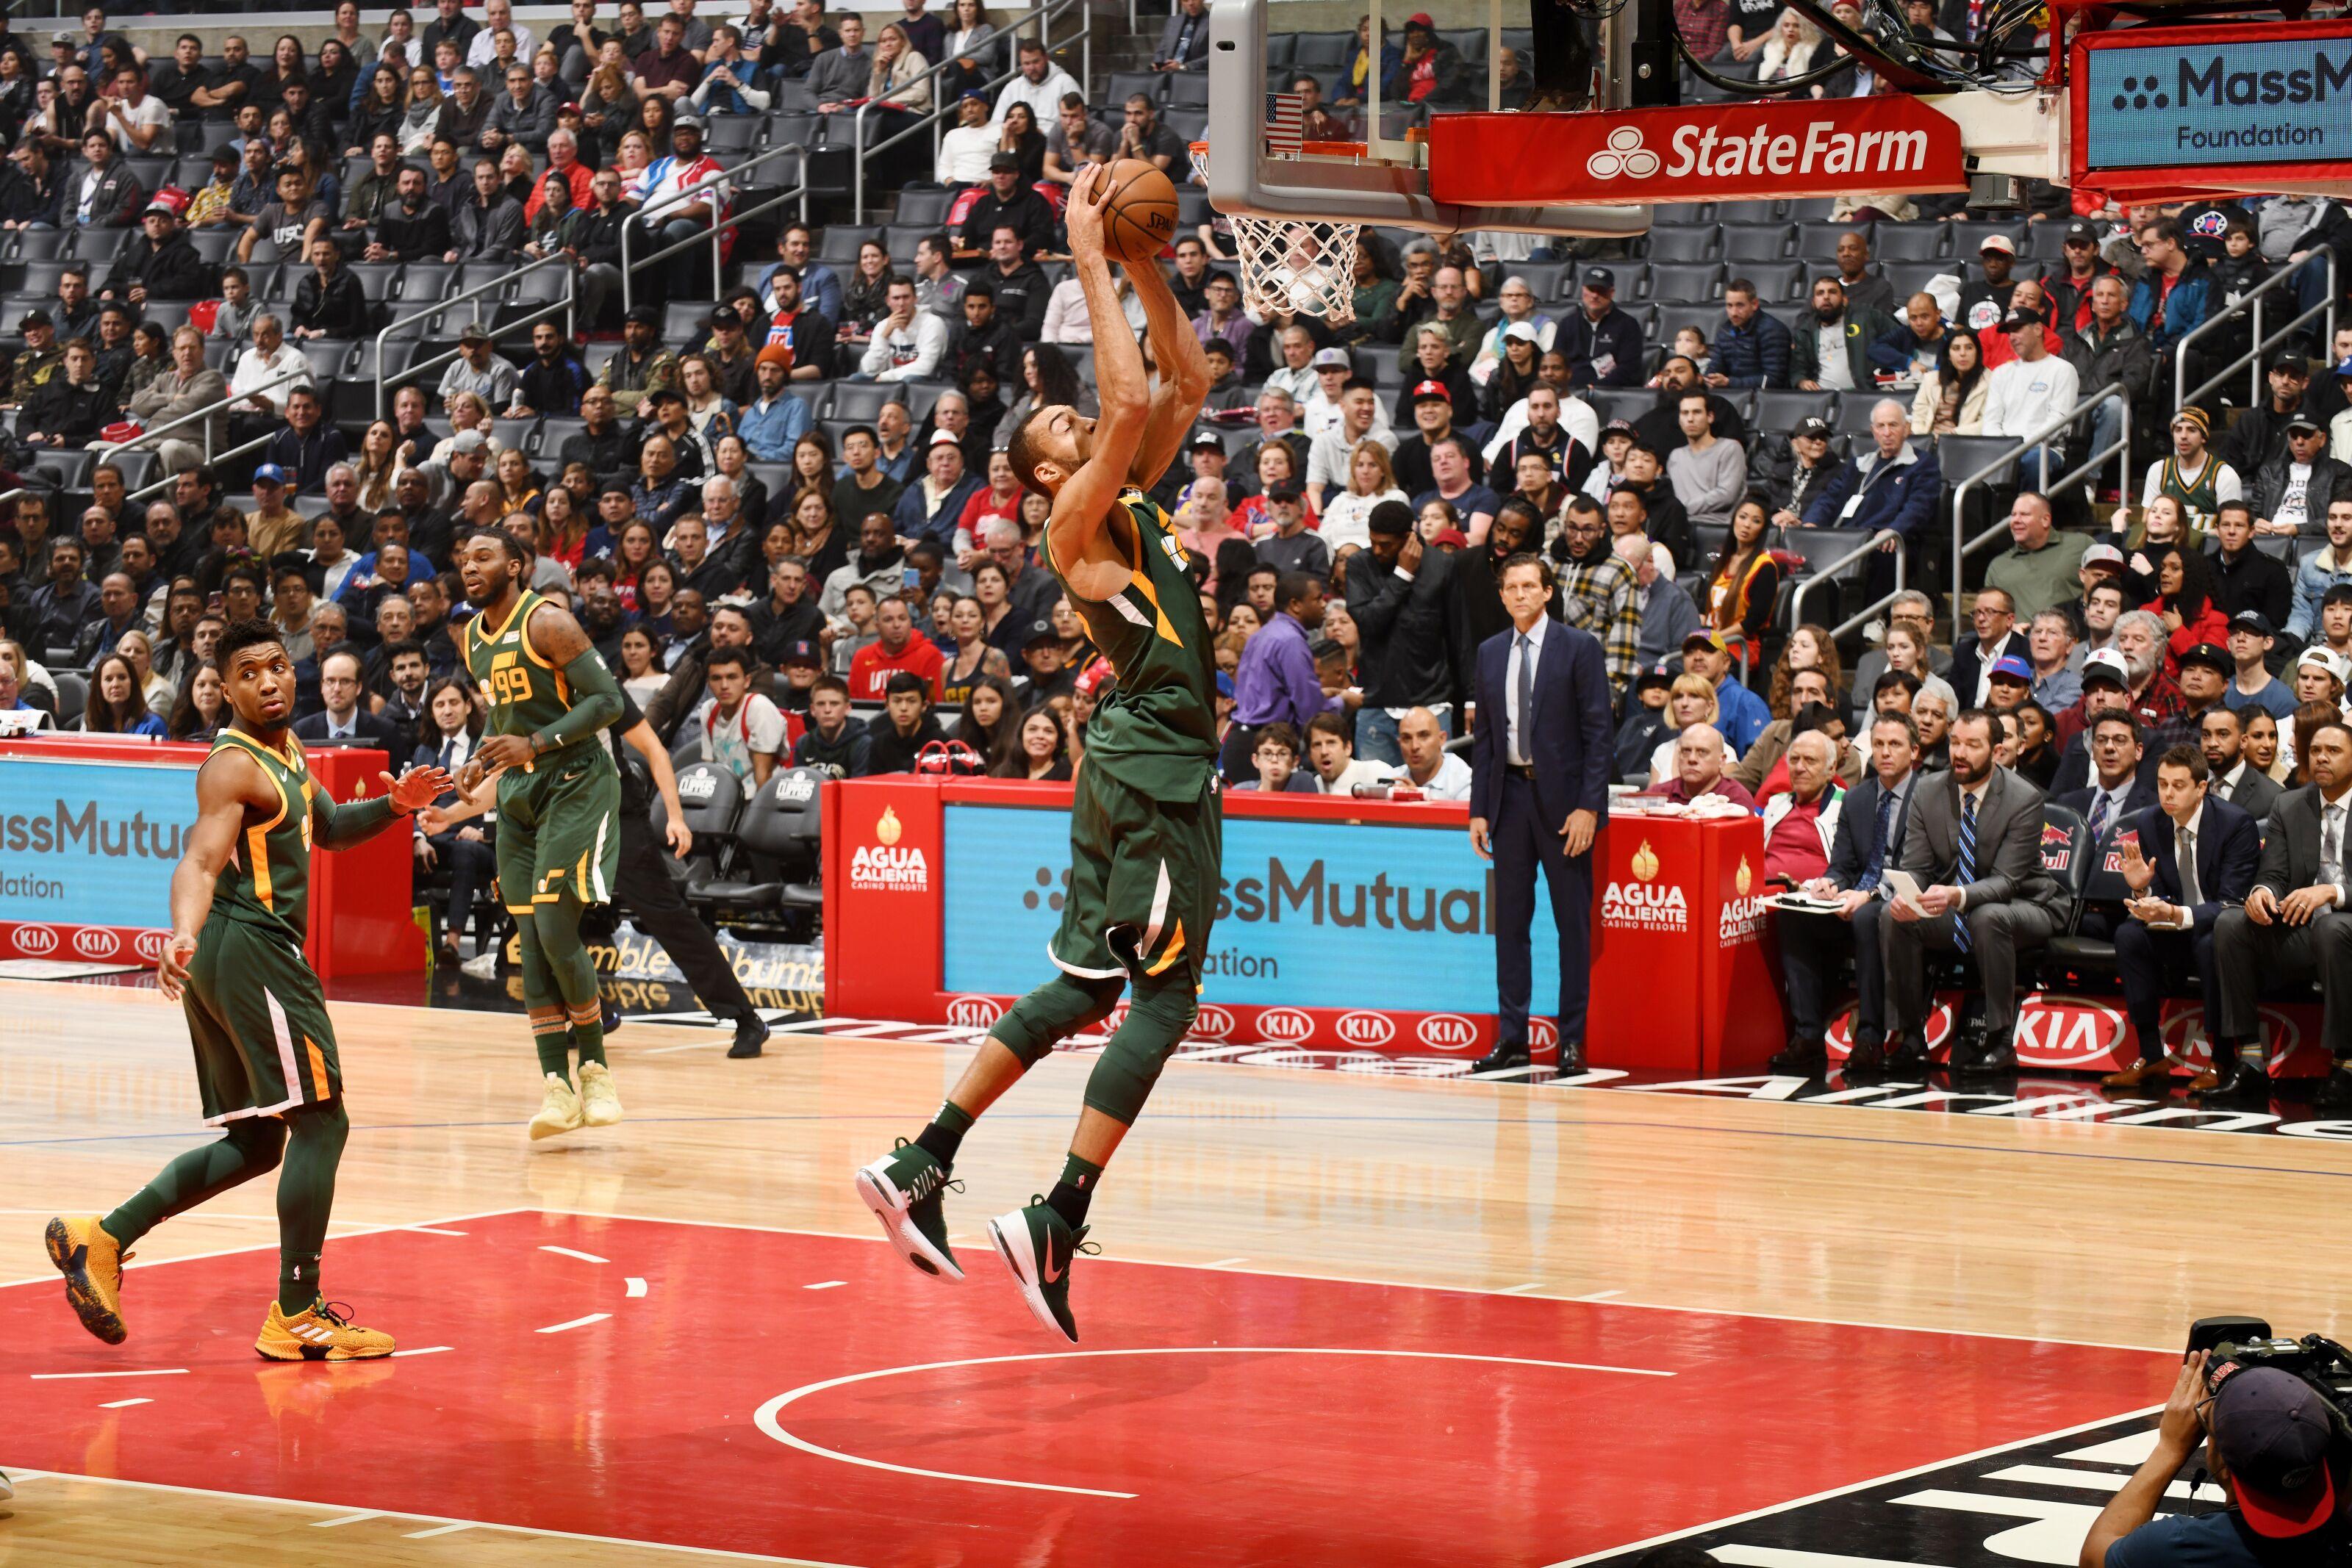 Utah Jazz: Rudy Gobert stifles LA Clippers in blowout win